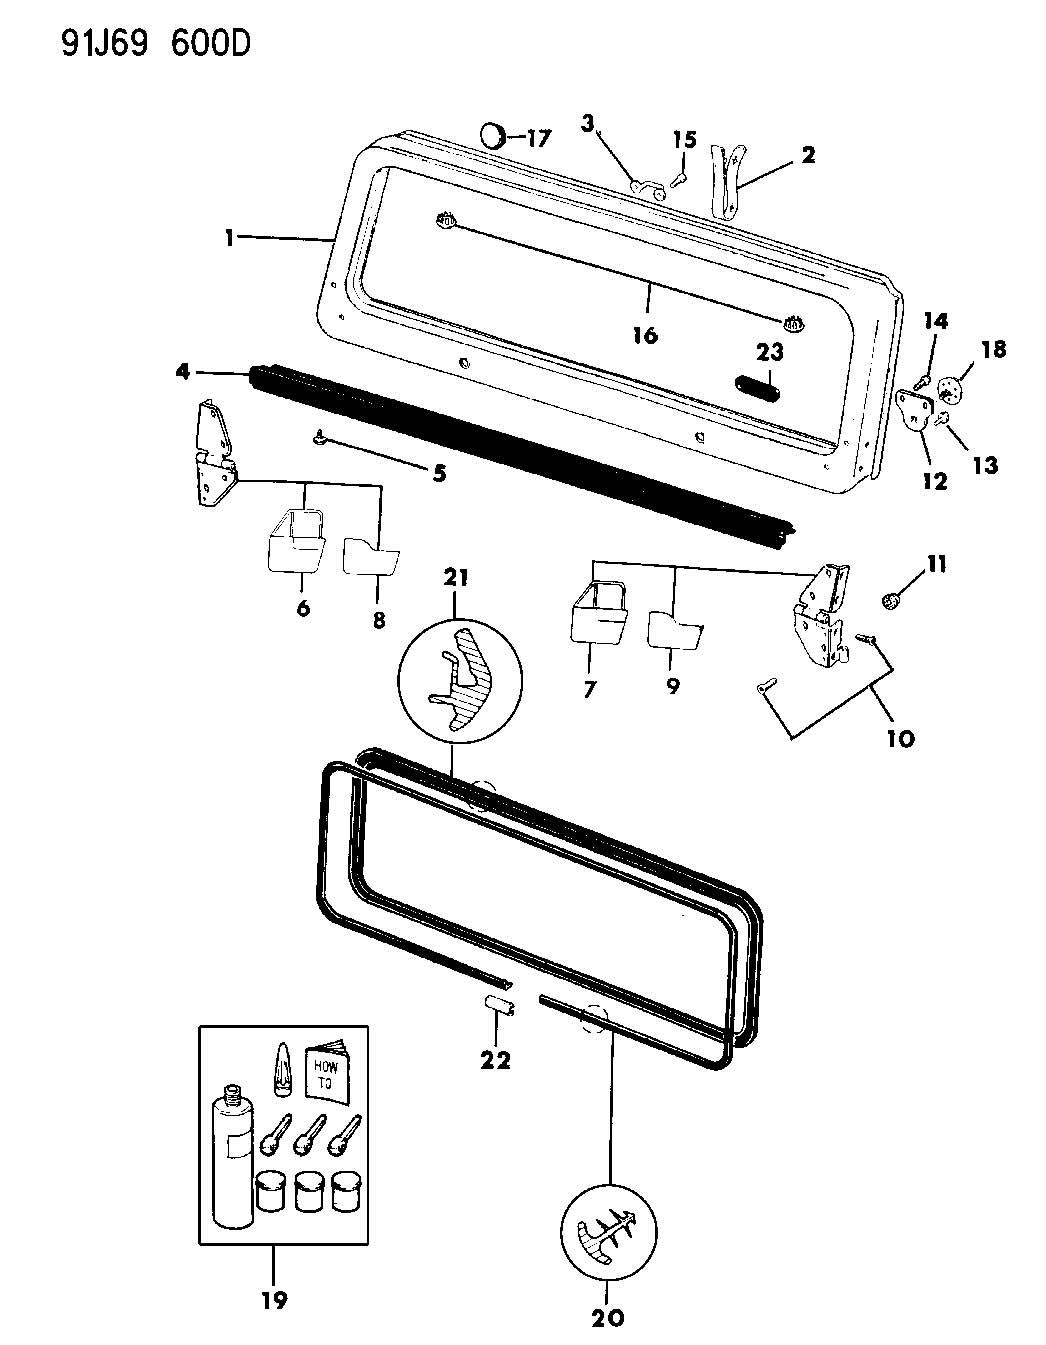 windshield frame  hinges  and seals wrangler  yj